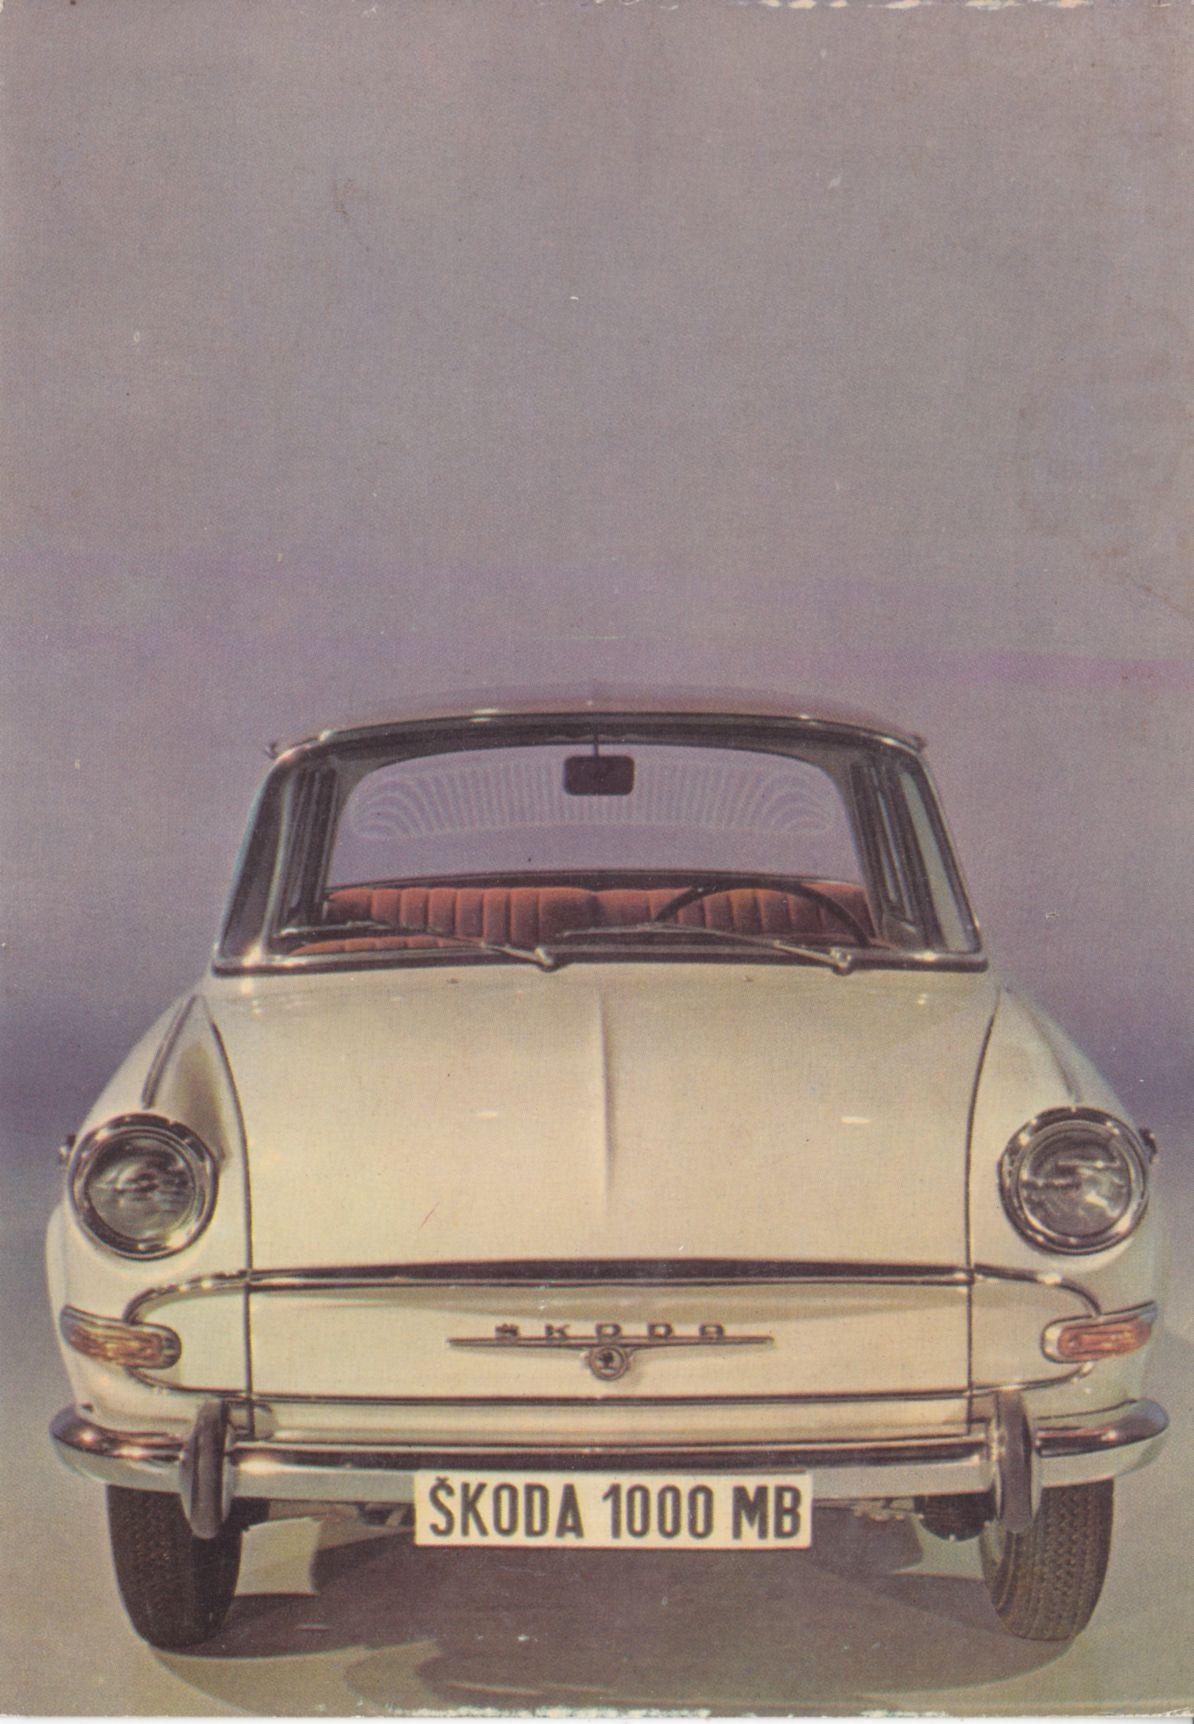 Skoda 1000 Mb Approx 1965 Auto Tekniikka